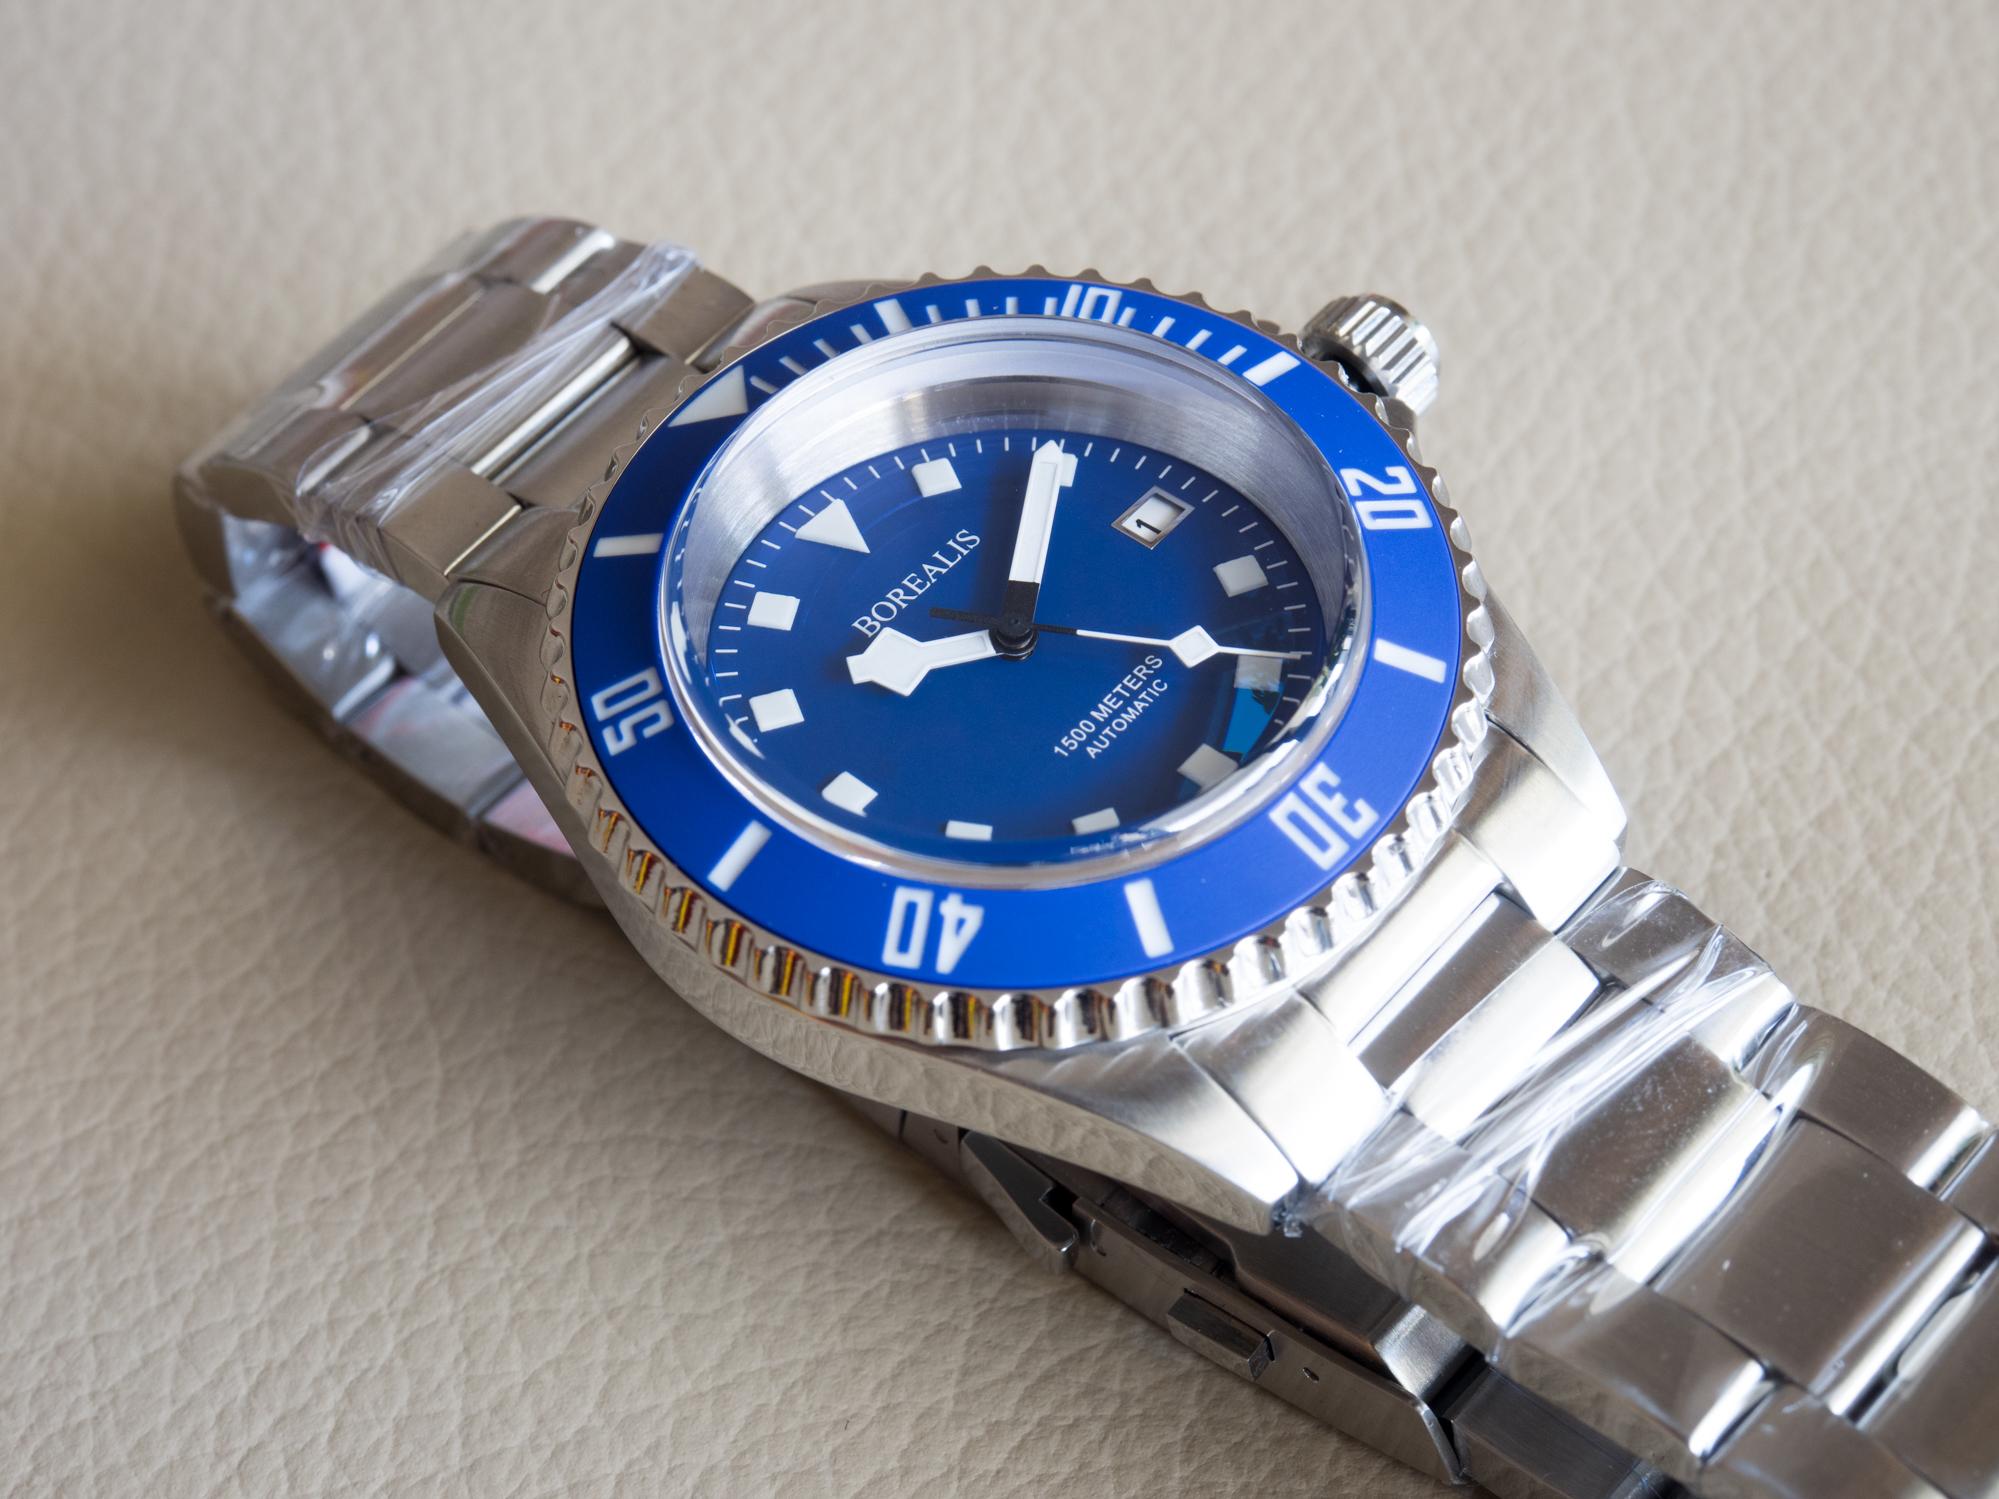 Borealis Sea Hawk 1500m Automatic Diver Watch Seiko NH36 / 4R36 Ceramic Blue Bezel Blue Dial BSH1500BLUE